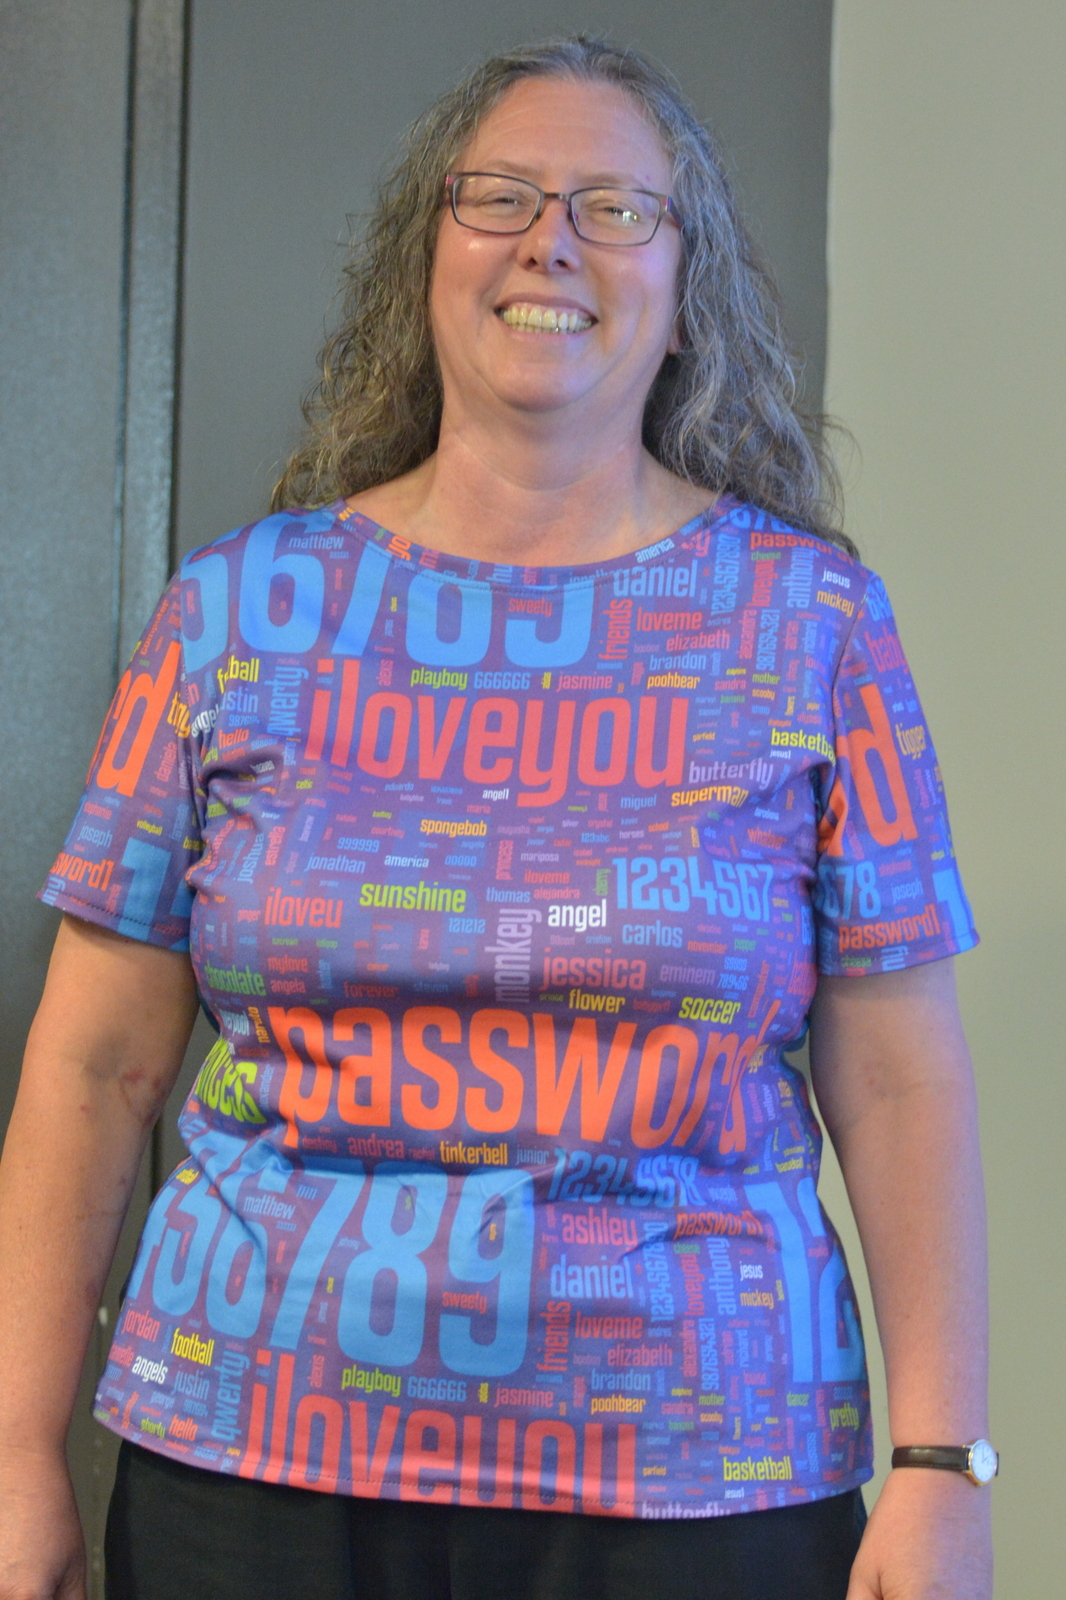 Bad passwords t-shirt